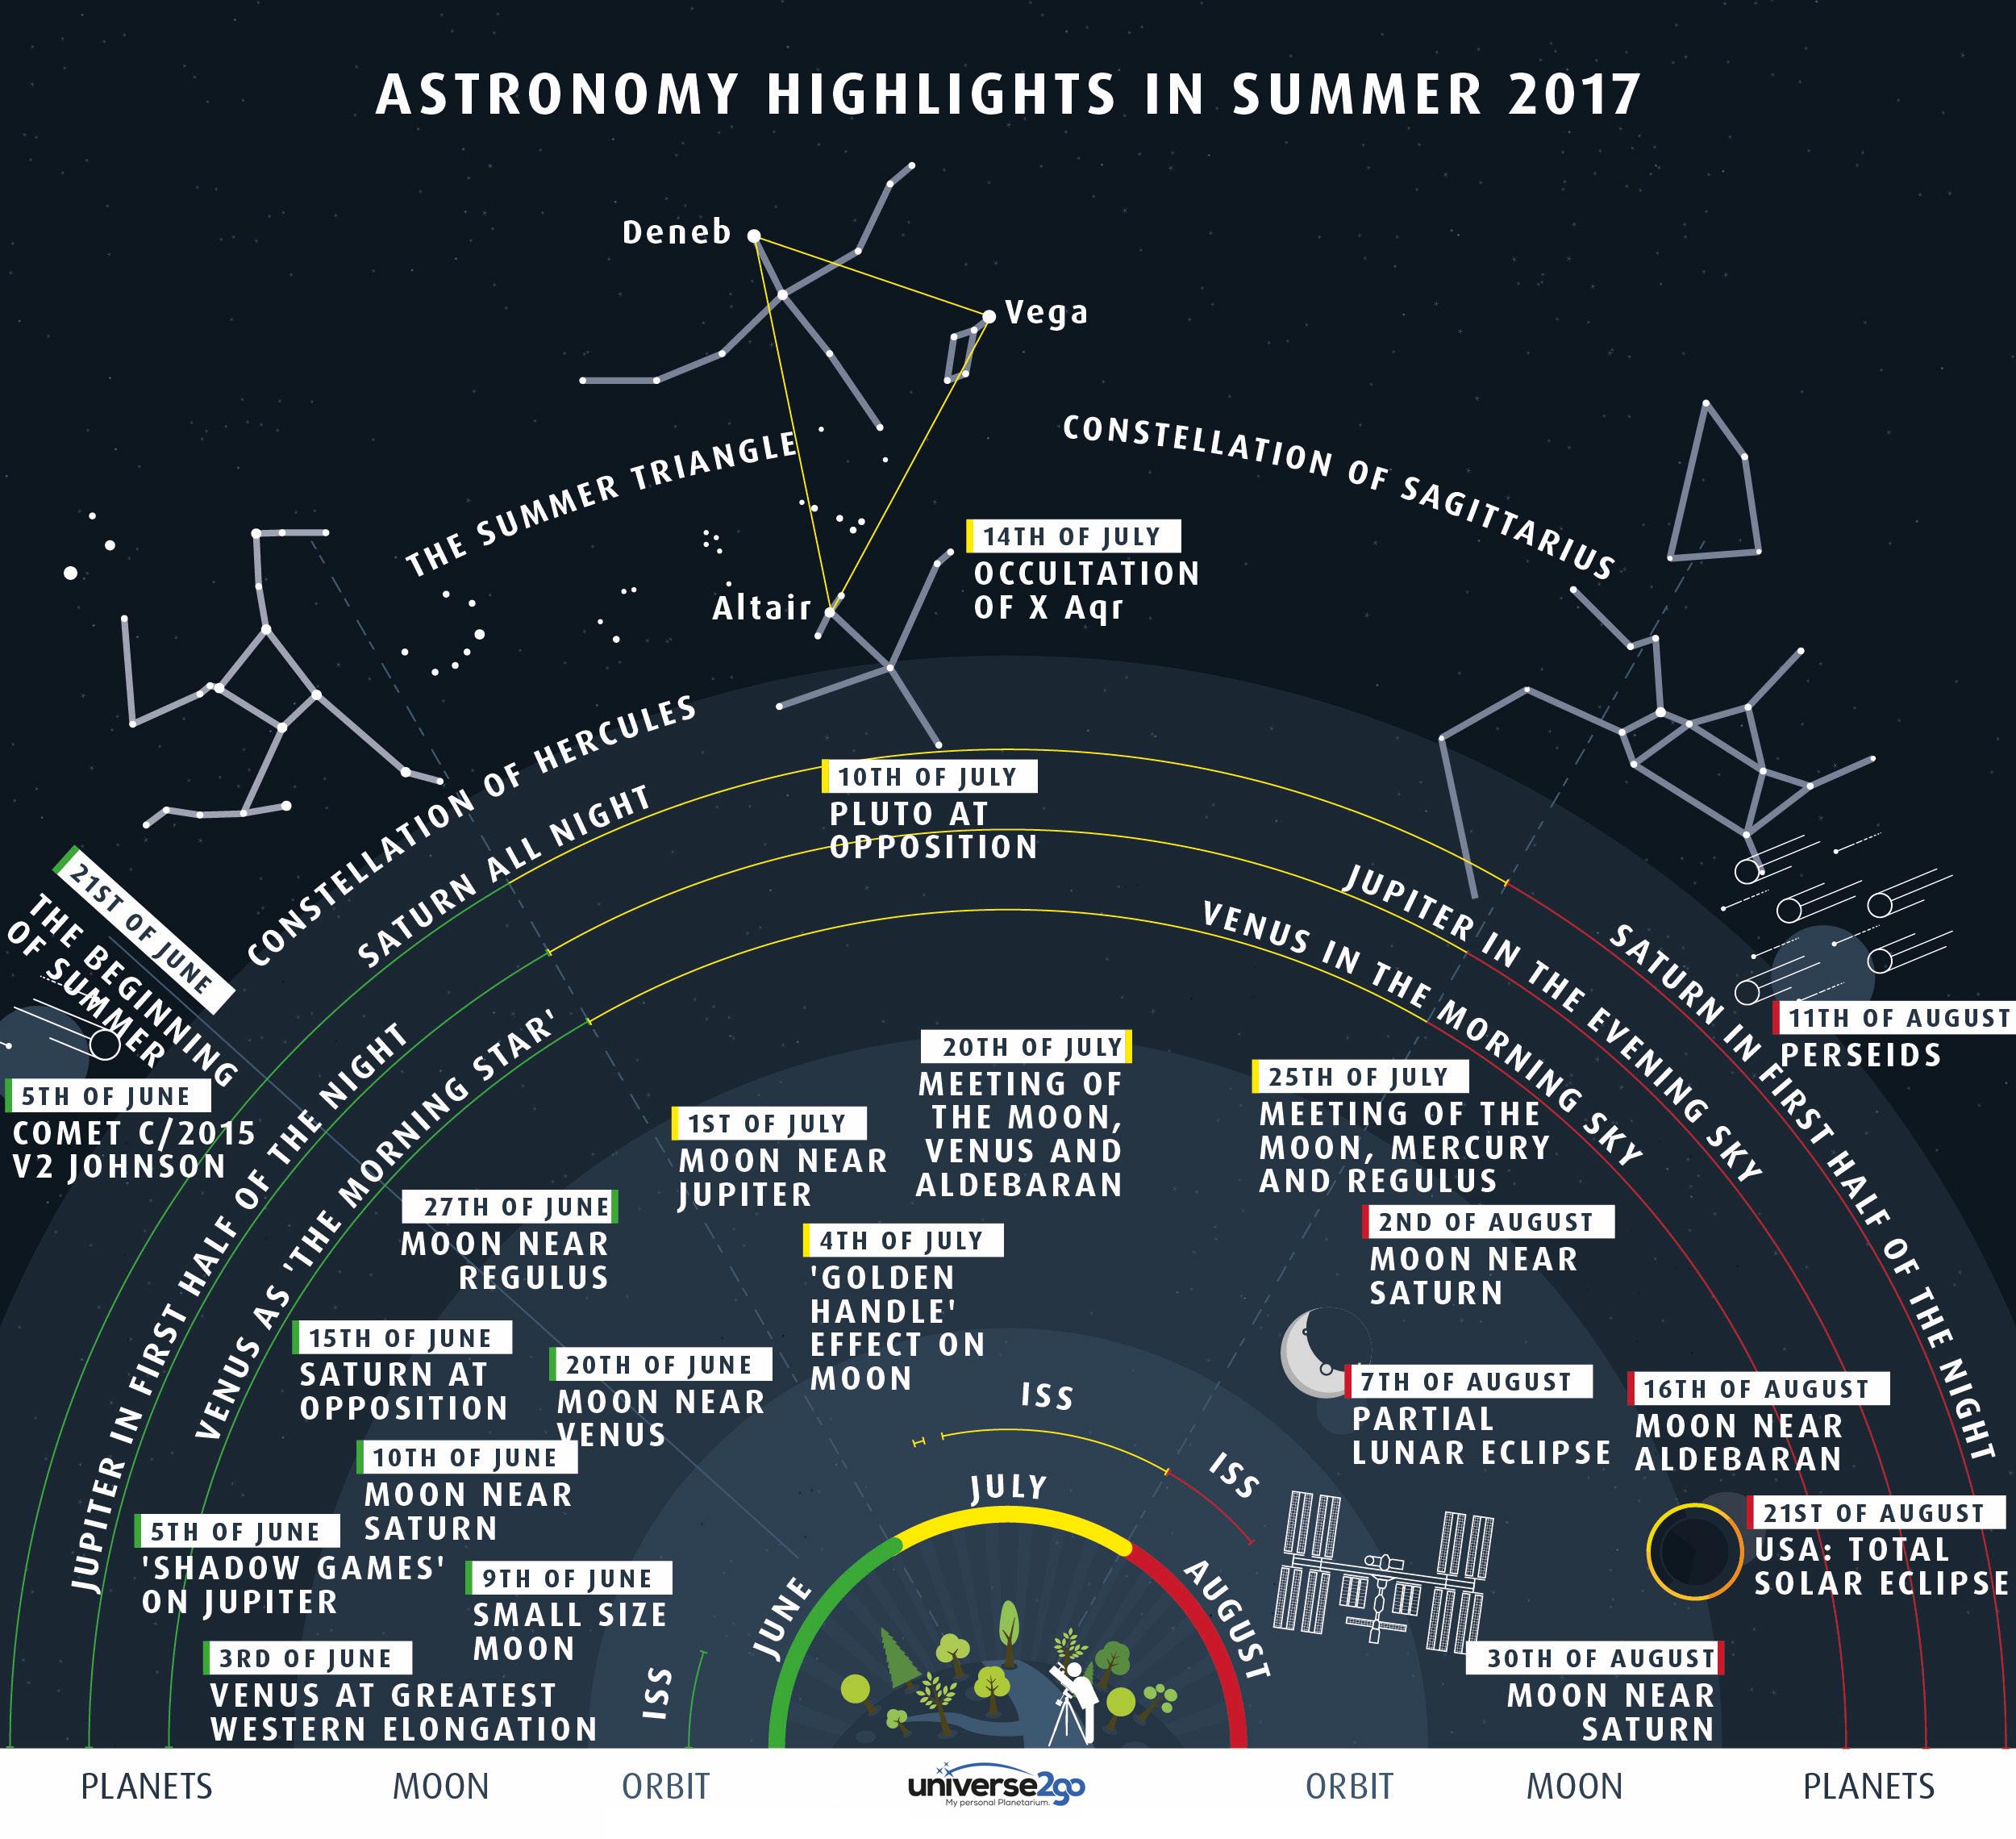 https://apod.nasa.gov/apod/image/1706/Summer2017Sky_universe2go_2500.jpg